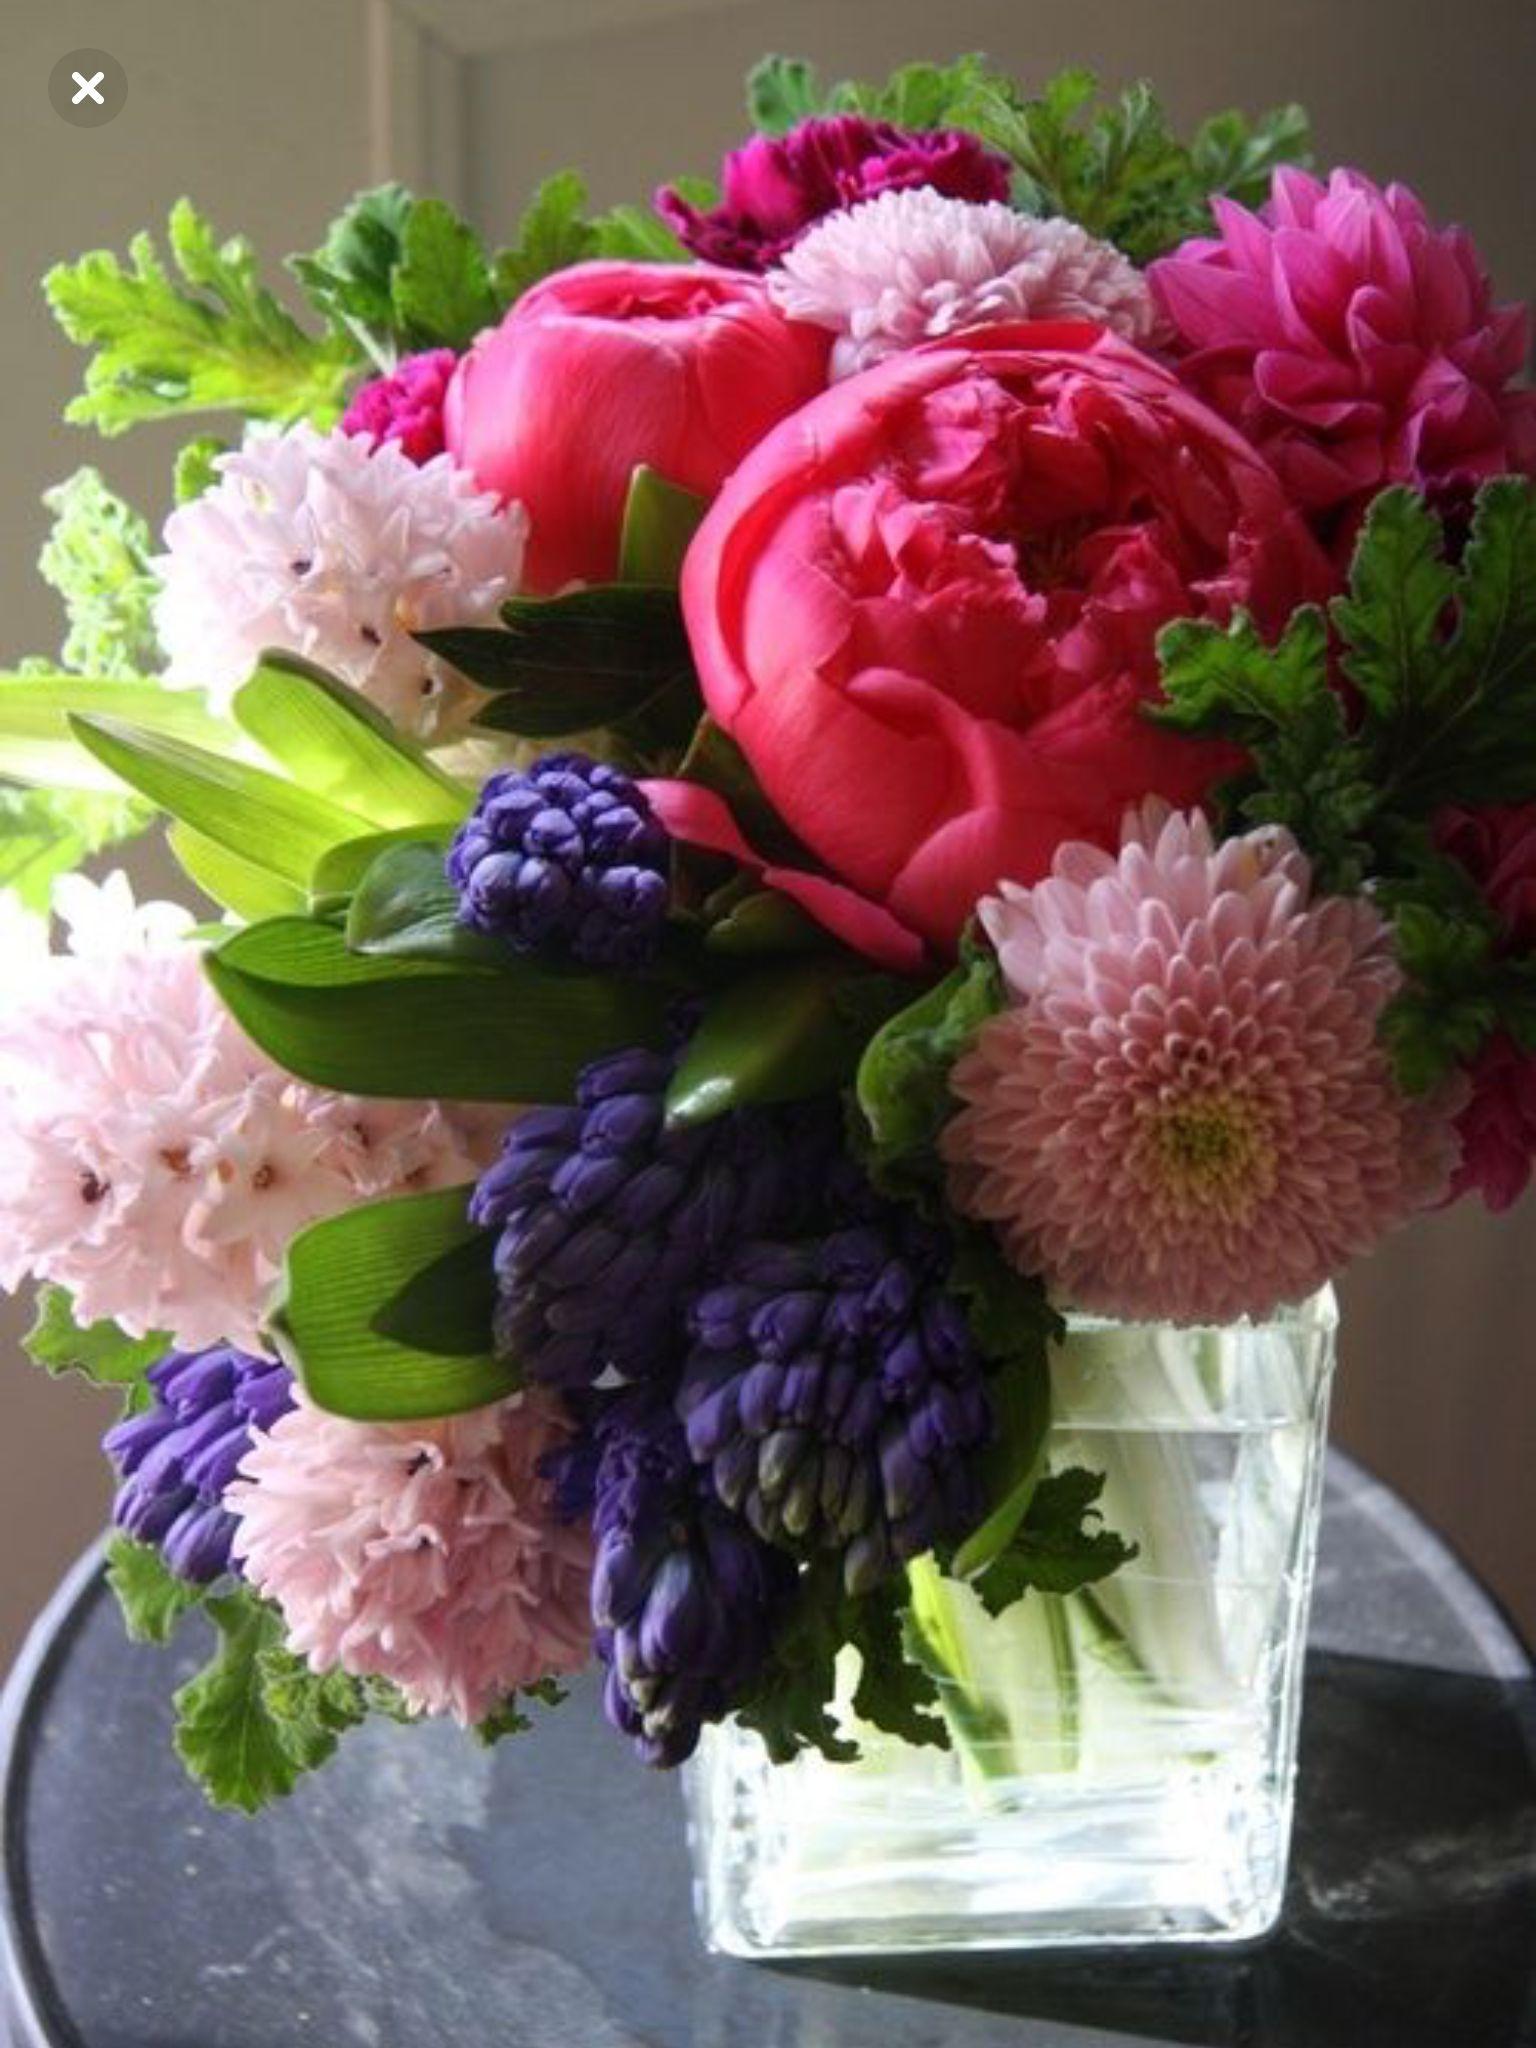 Pin by VRingl on Blumen | Pinterest | Flowers, Flower arrangements ...